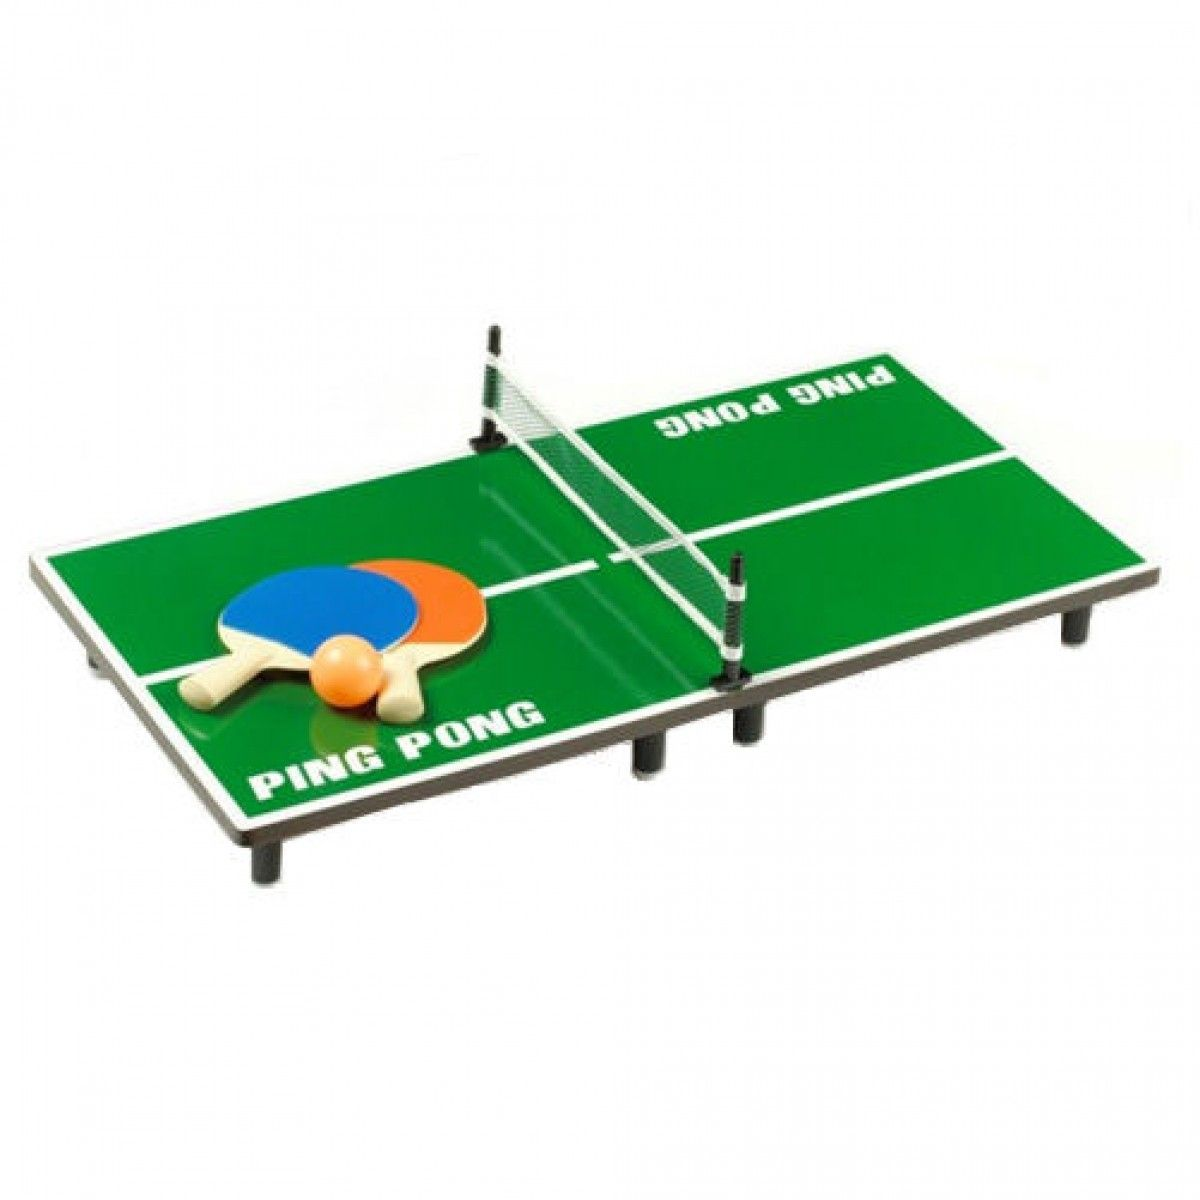 Tabletop Ping Pong Tennis Game Tennis Games Table Tennis Ping Pong